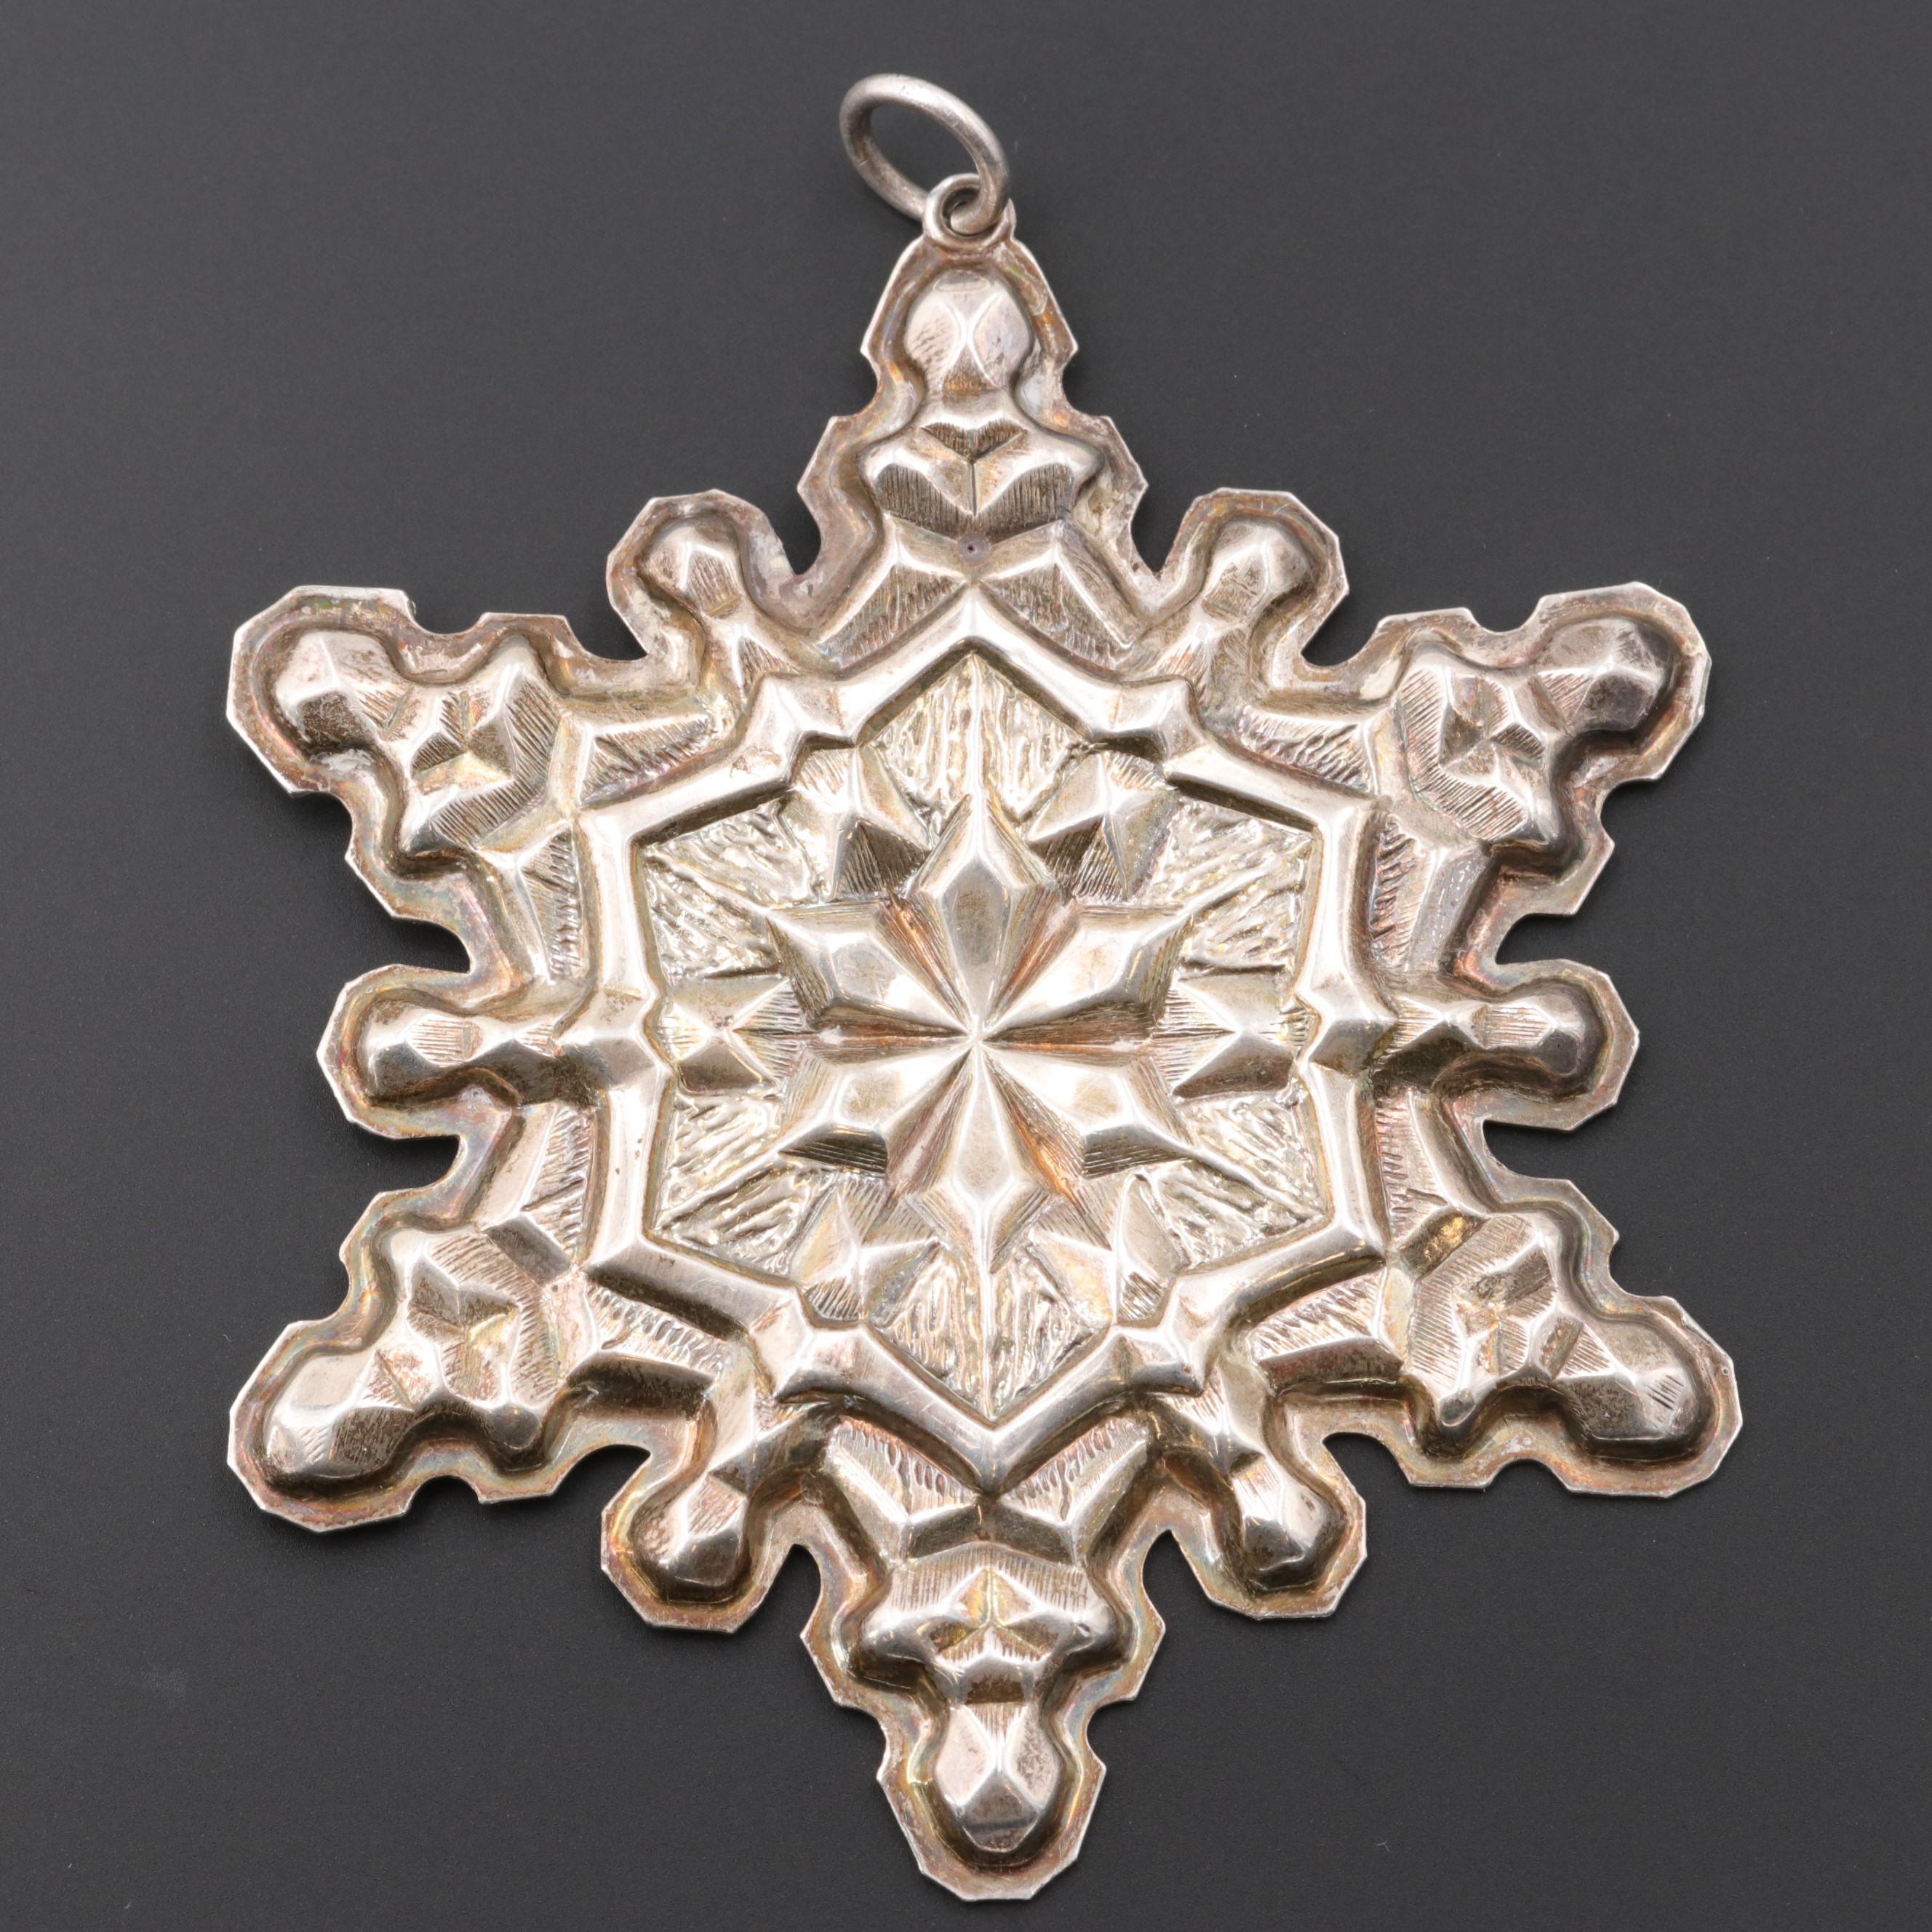 Circa 1971 Gorham Sterling Silver Snowflake Christmas Ornament